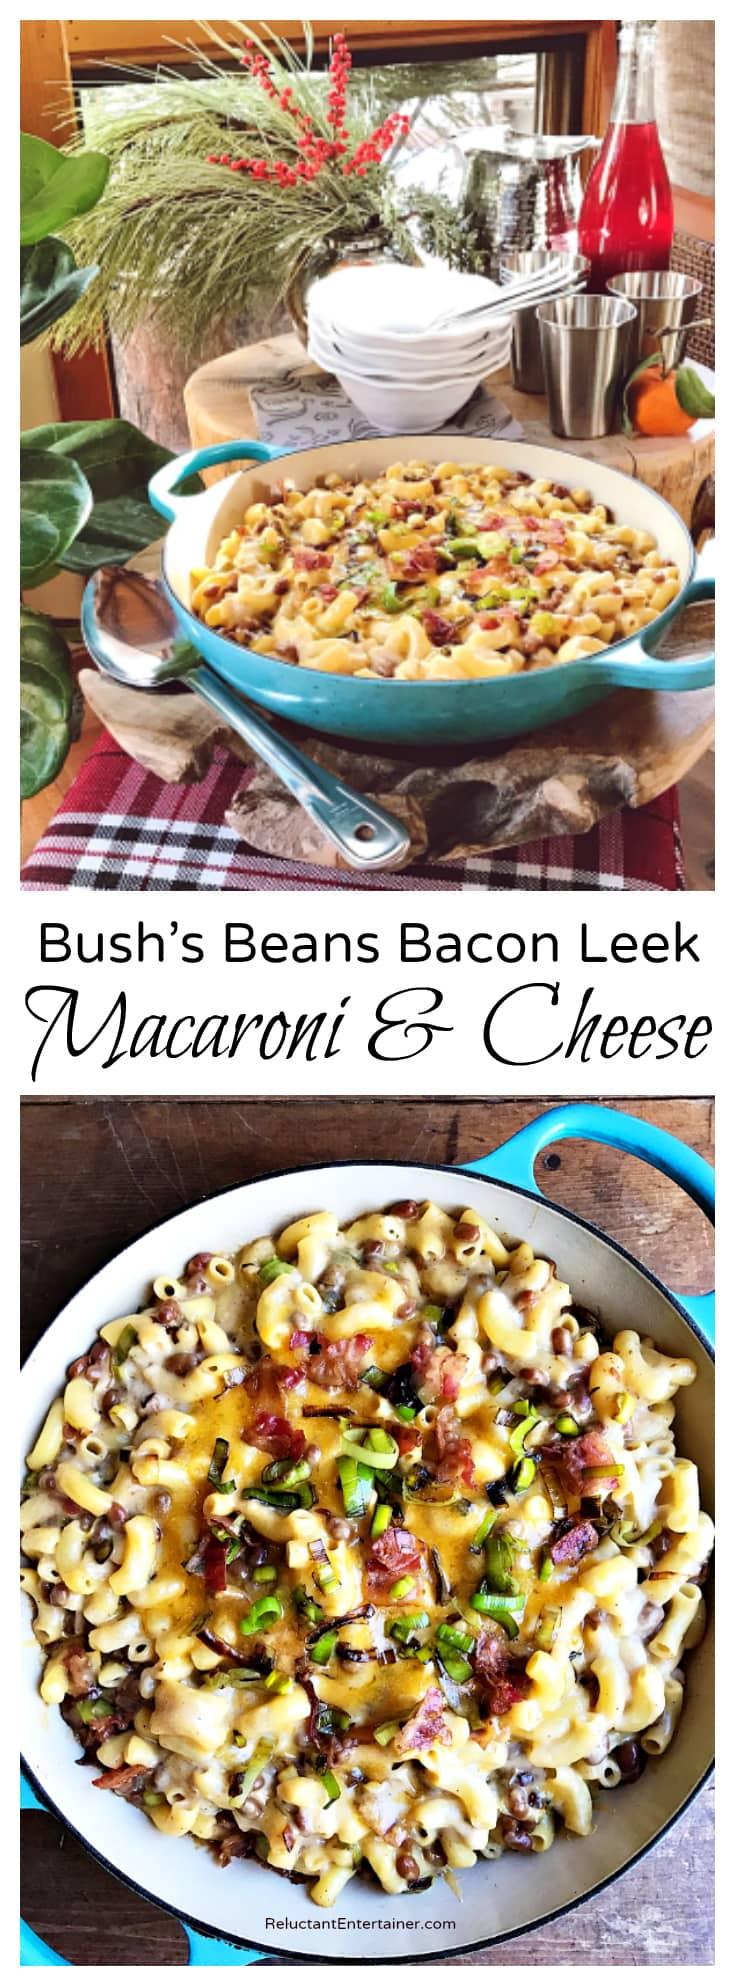 Bush's Beans Bacon Leek Macaroni and Cheese